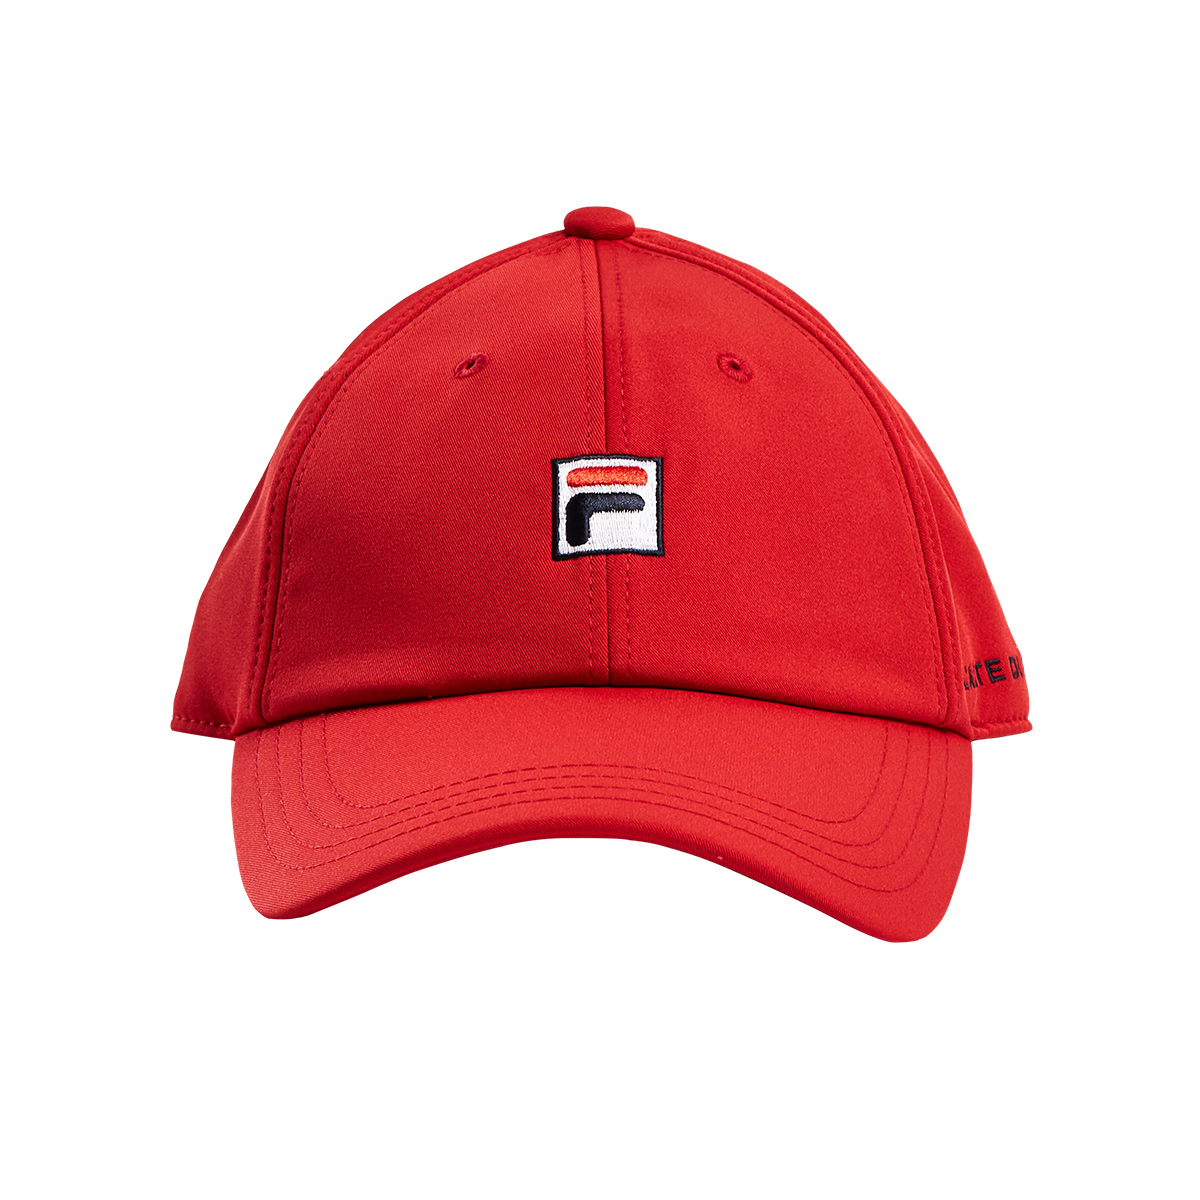 Hot Deals Fila Musim Semi Baru Kasual Topi Topi (Cahaya Fluoresensi ... 87e8950a5b